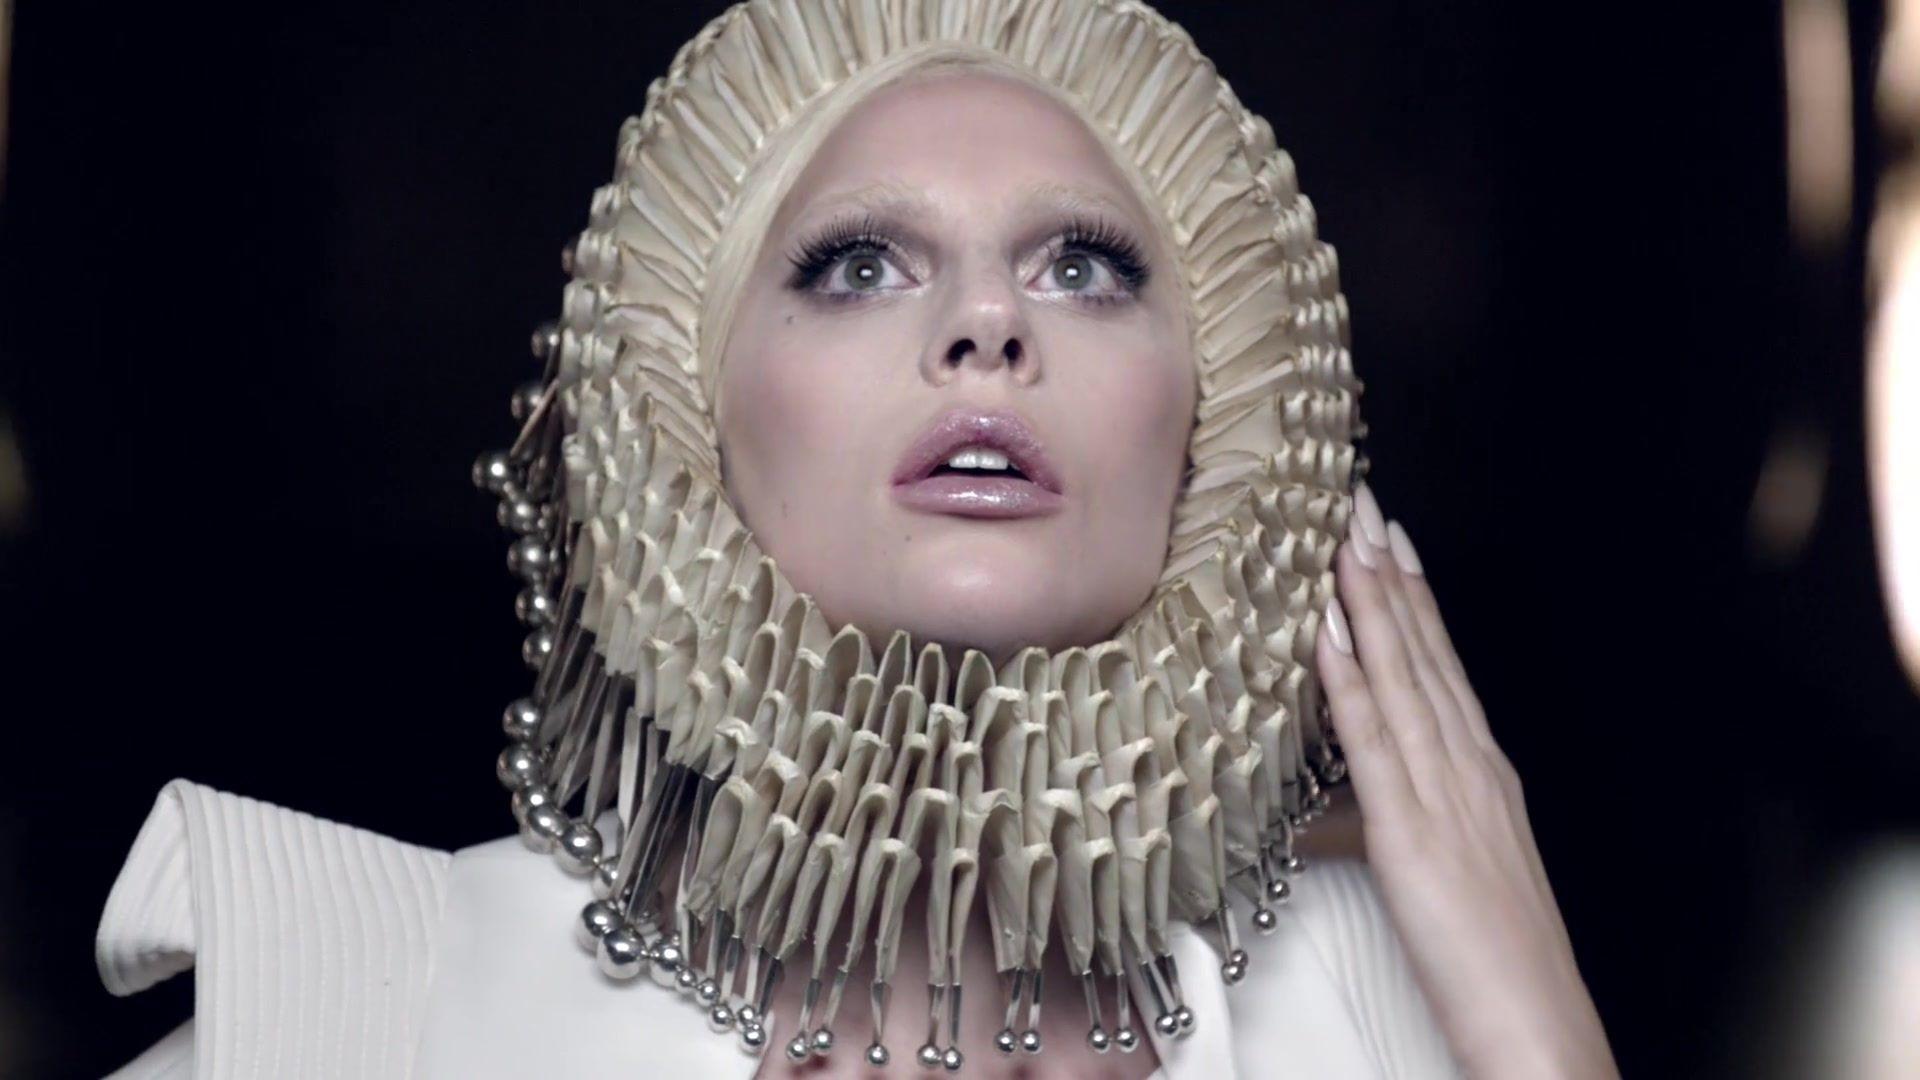 2015-Dec-Intel-x-Gaga-6.jpg